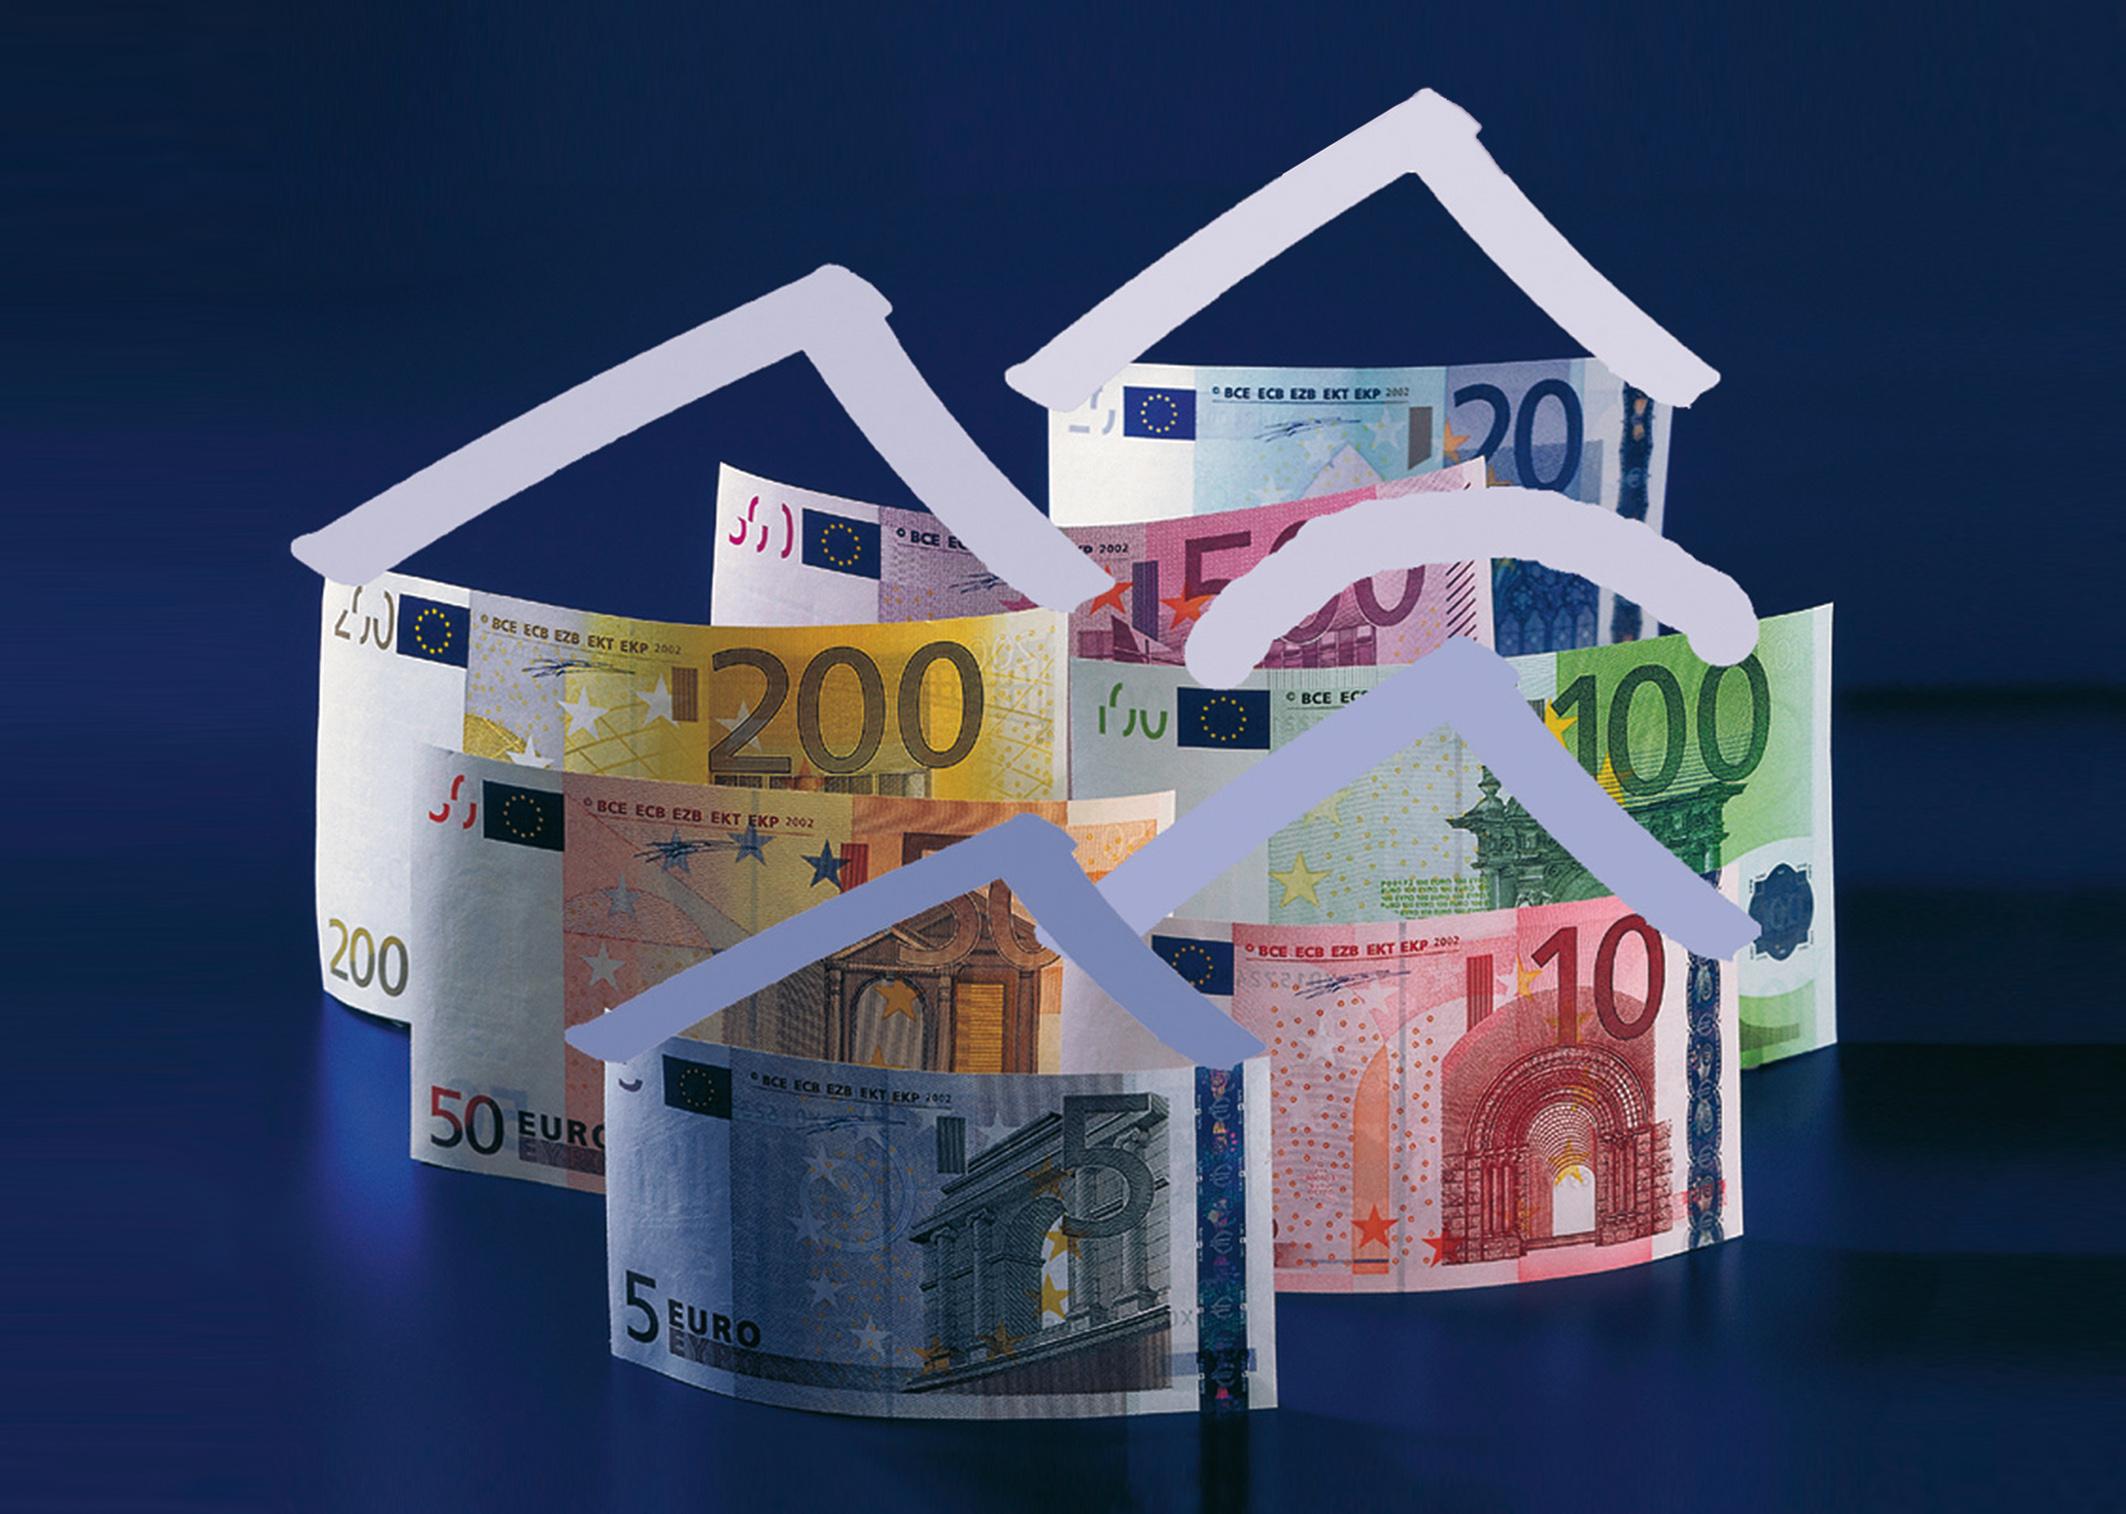 Kostenloses Verkaufwertgutachten für Immobilien in Berlin